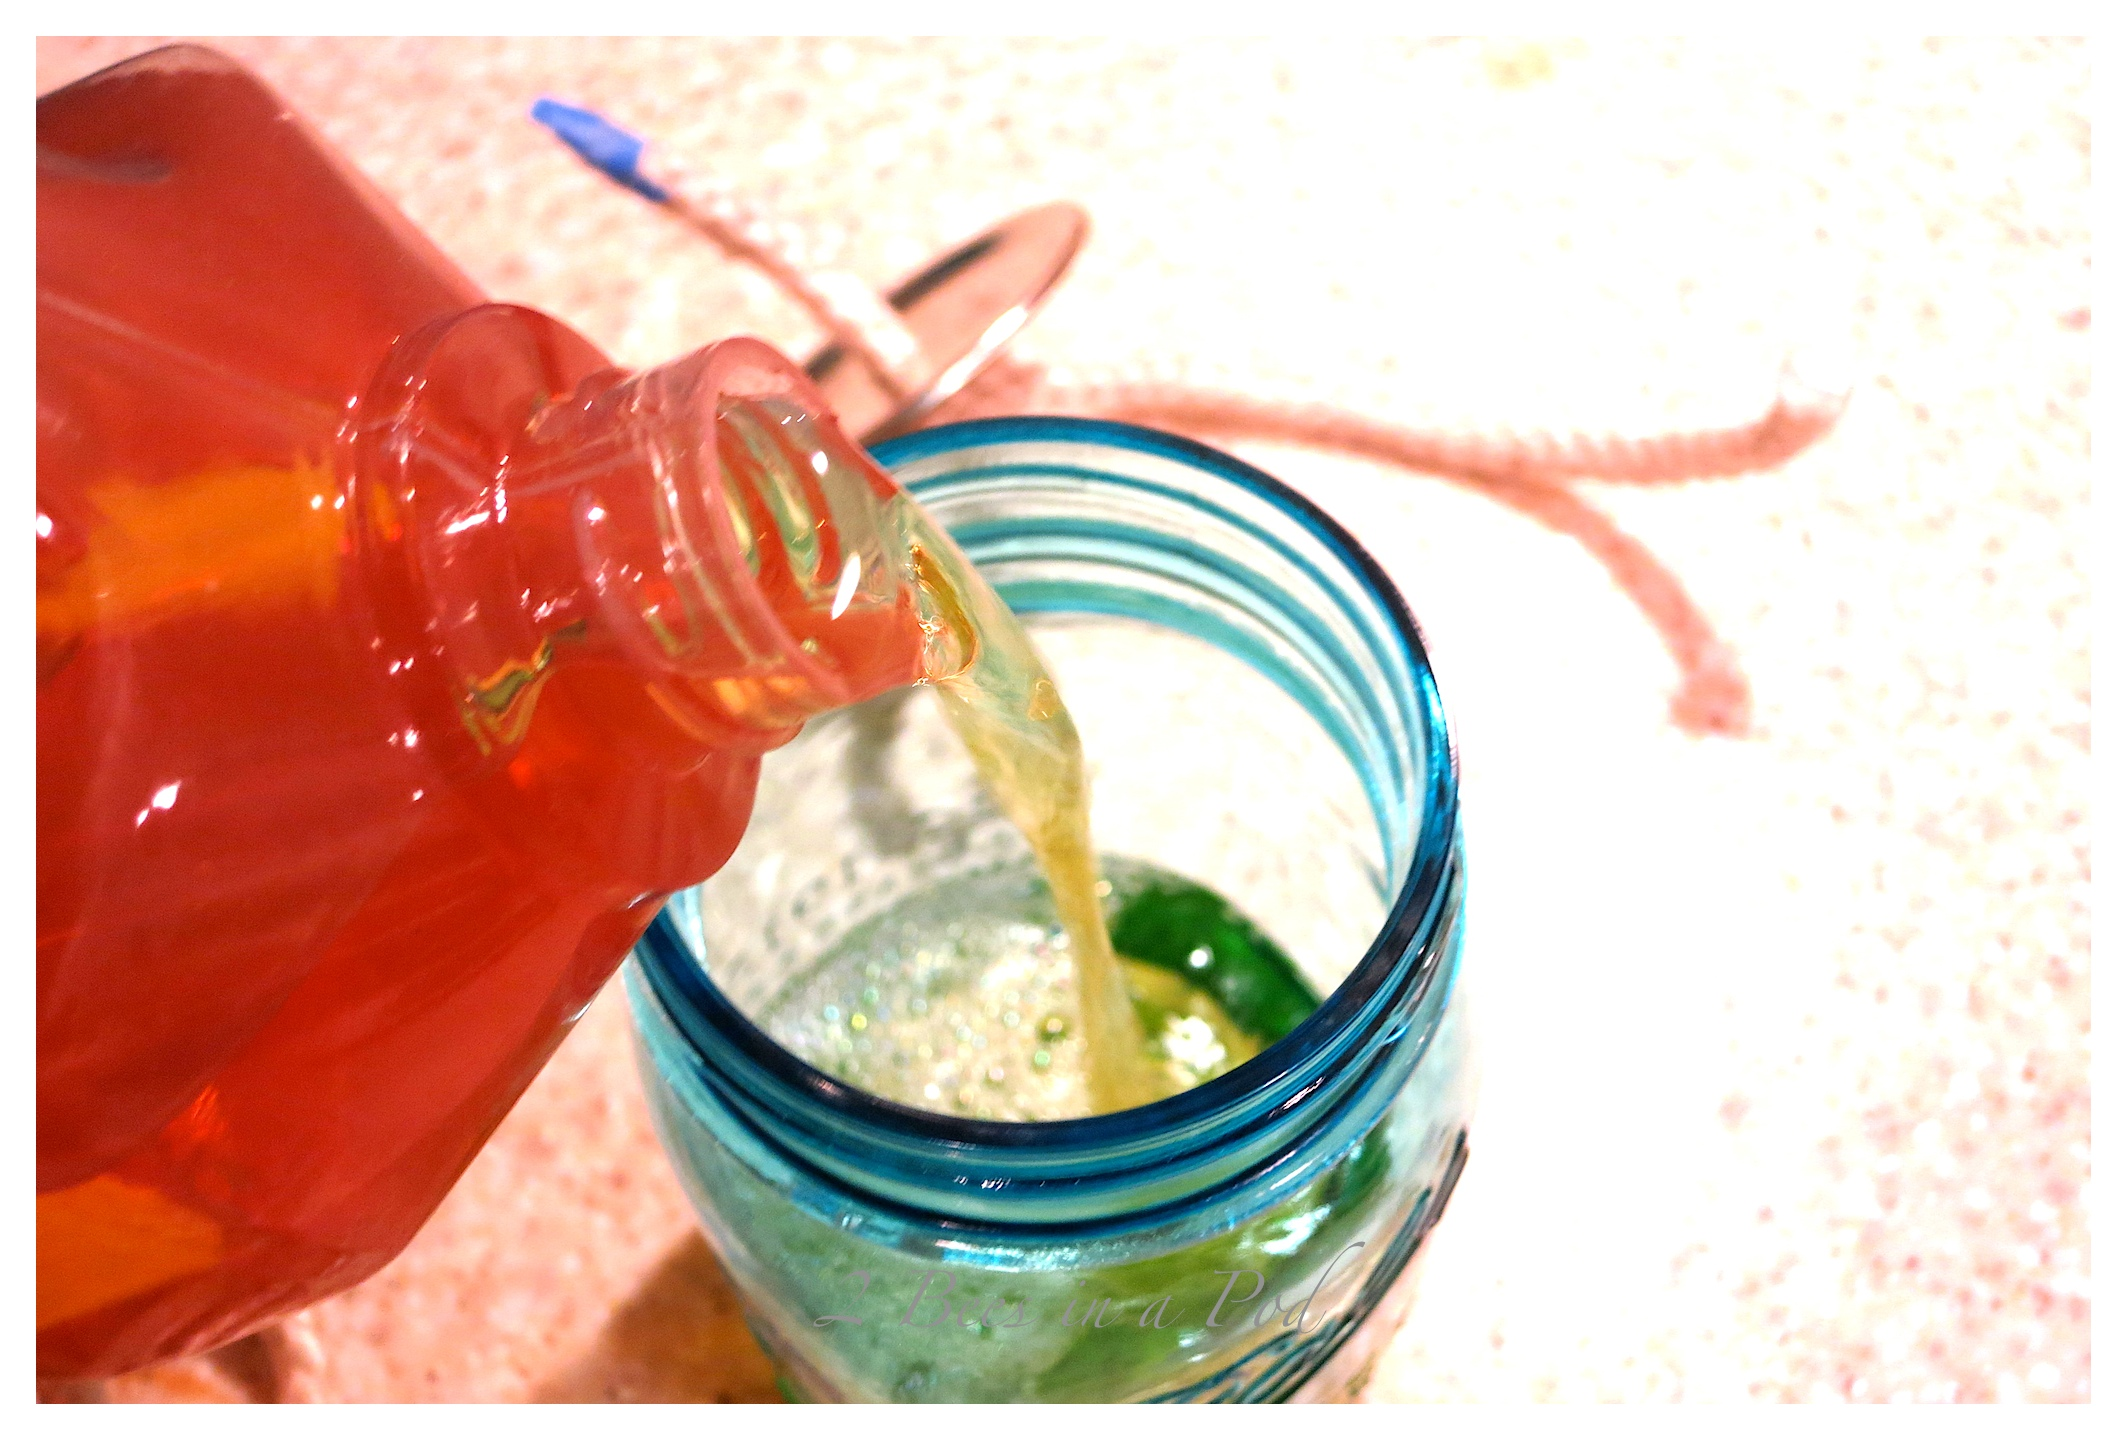 DIY Mason Jar Citronella Candle Oil Lamp. All You Need Is A Mason Jar,